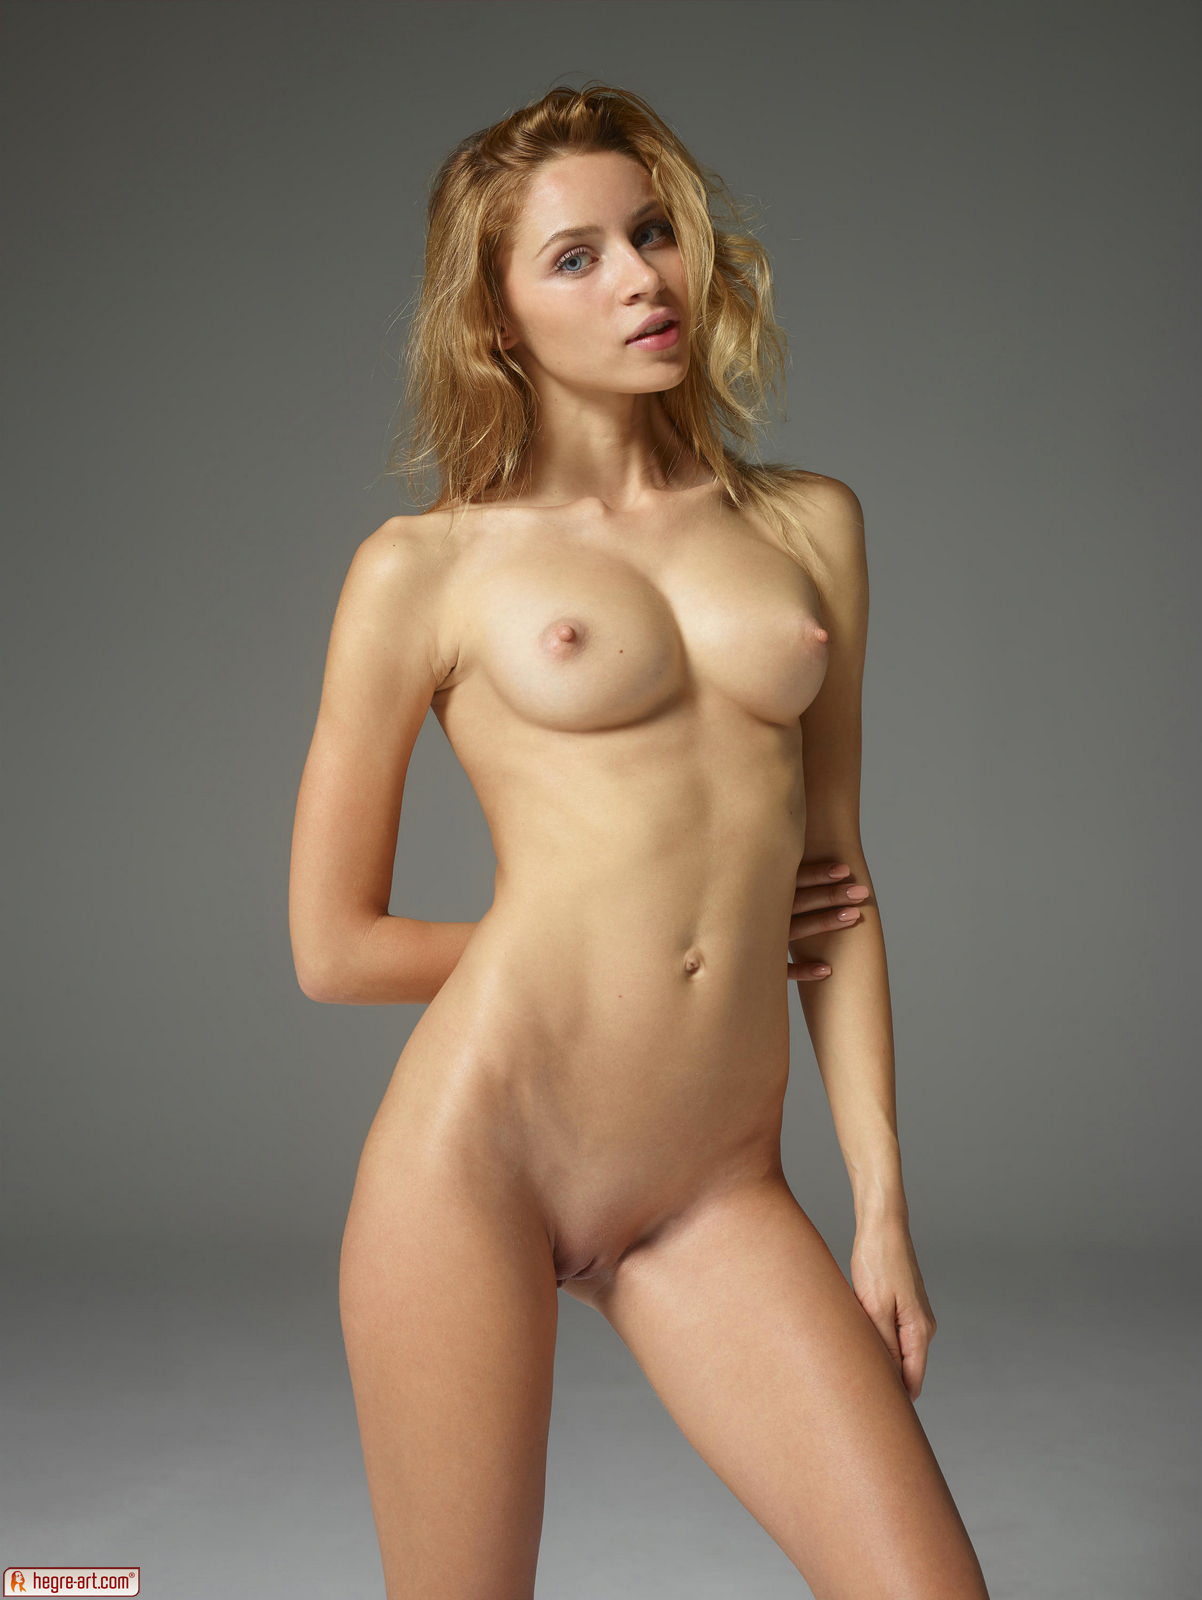 katrina kaif naked in bed